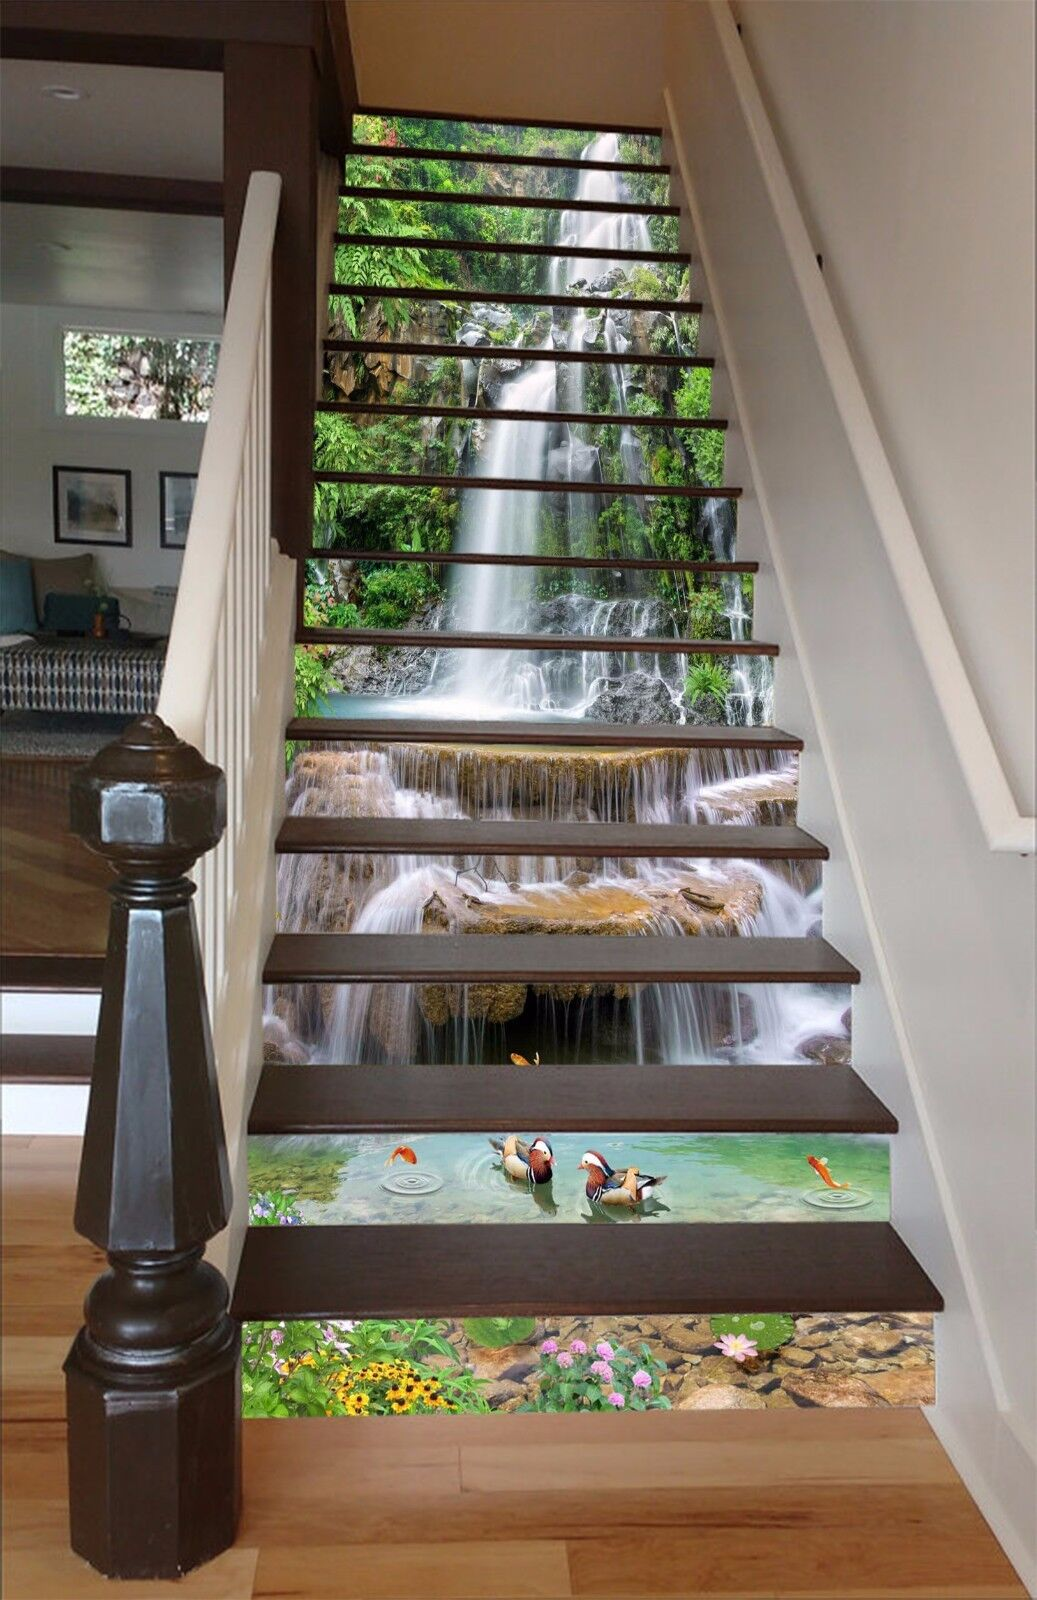 3D Waterfall pond7 Stair Risers Decoration Photo Mural Vinyl Decal Wallpaper UK